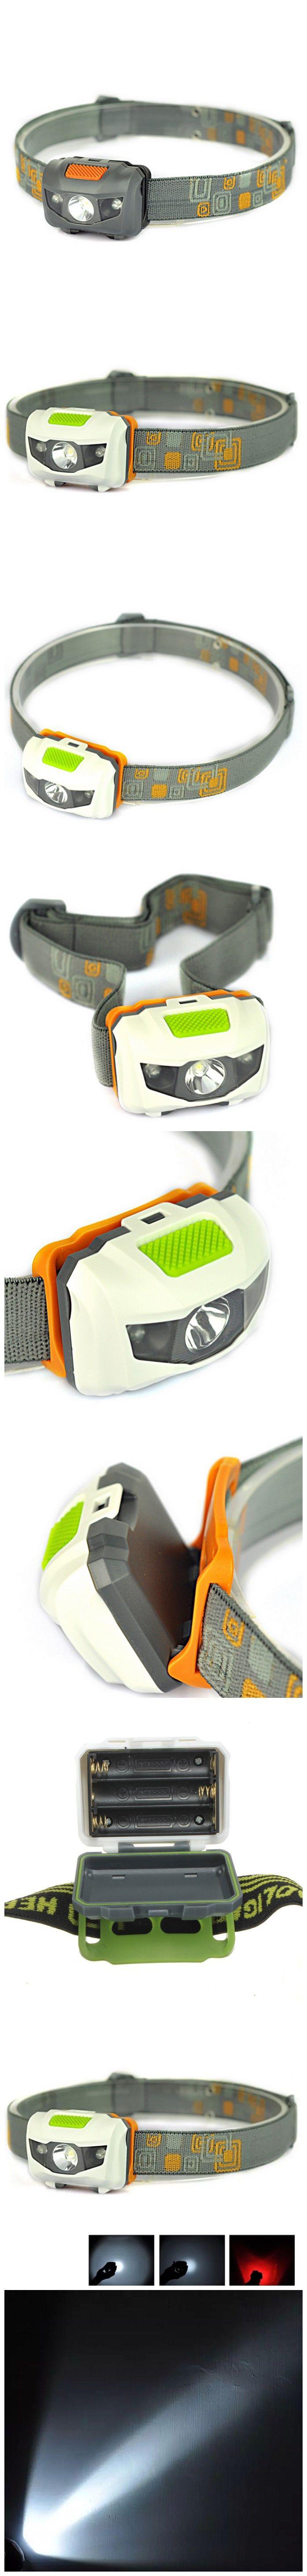 Mini Portable Headlamp 600LM Headlight Cree R3 Headlamps 2 LED Flashlight Headlights Torch Lanterna With Headband Hiking Camping